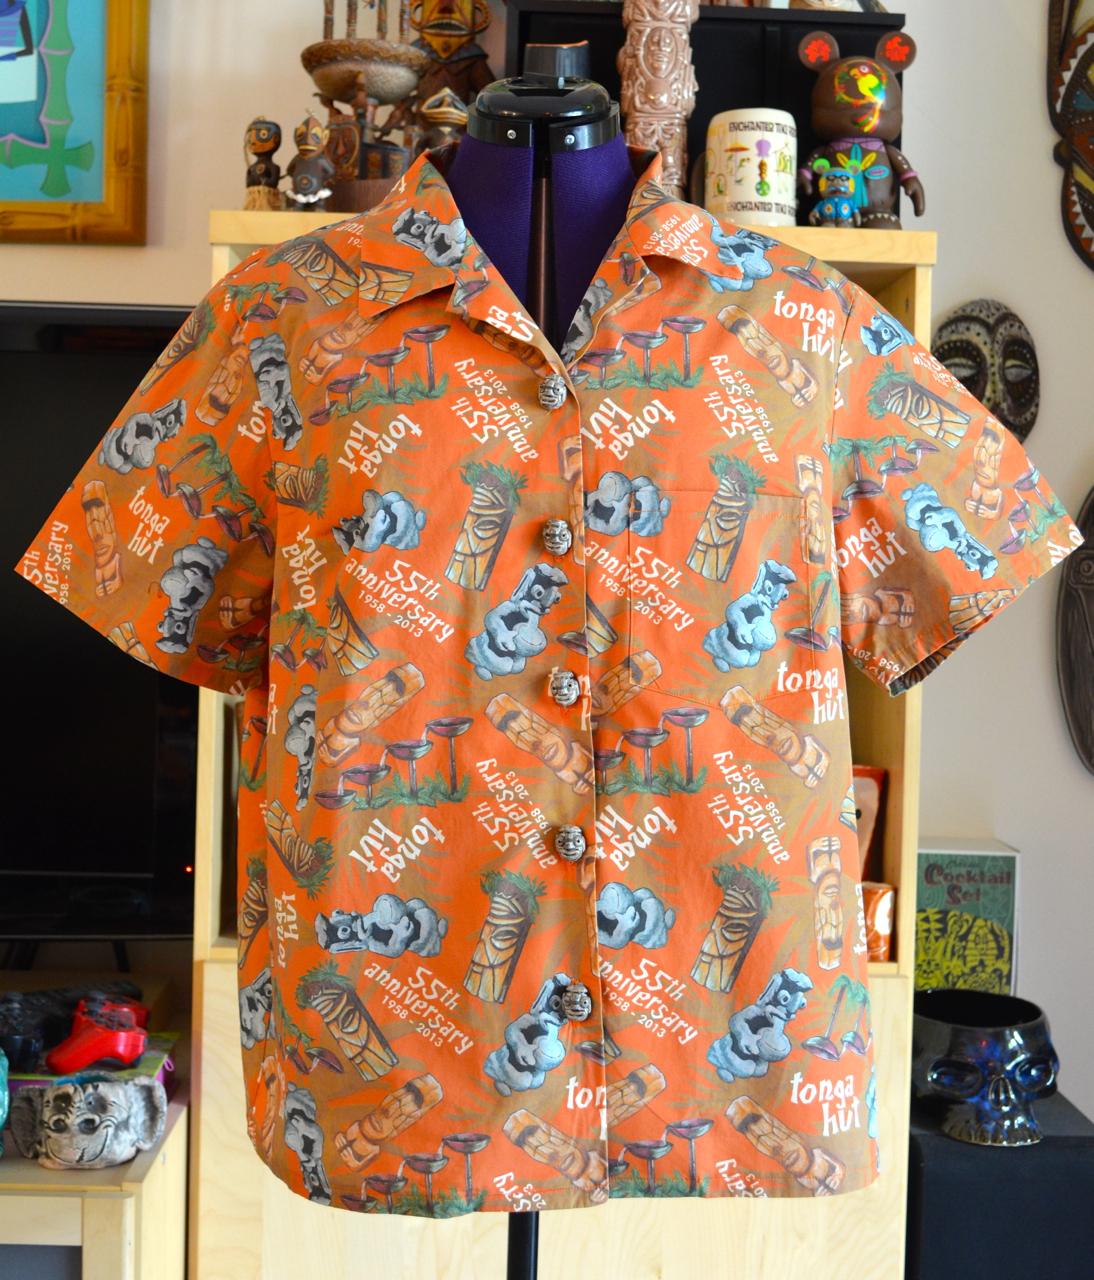 Tonga Hut 55th Anniversary aloha shirt